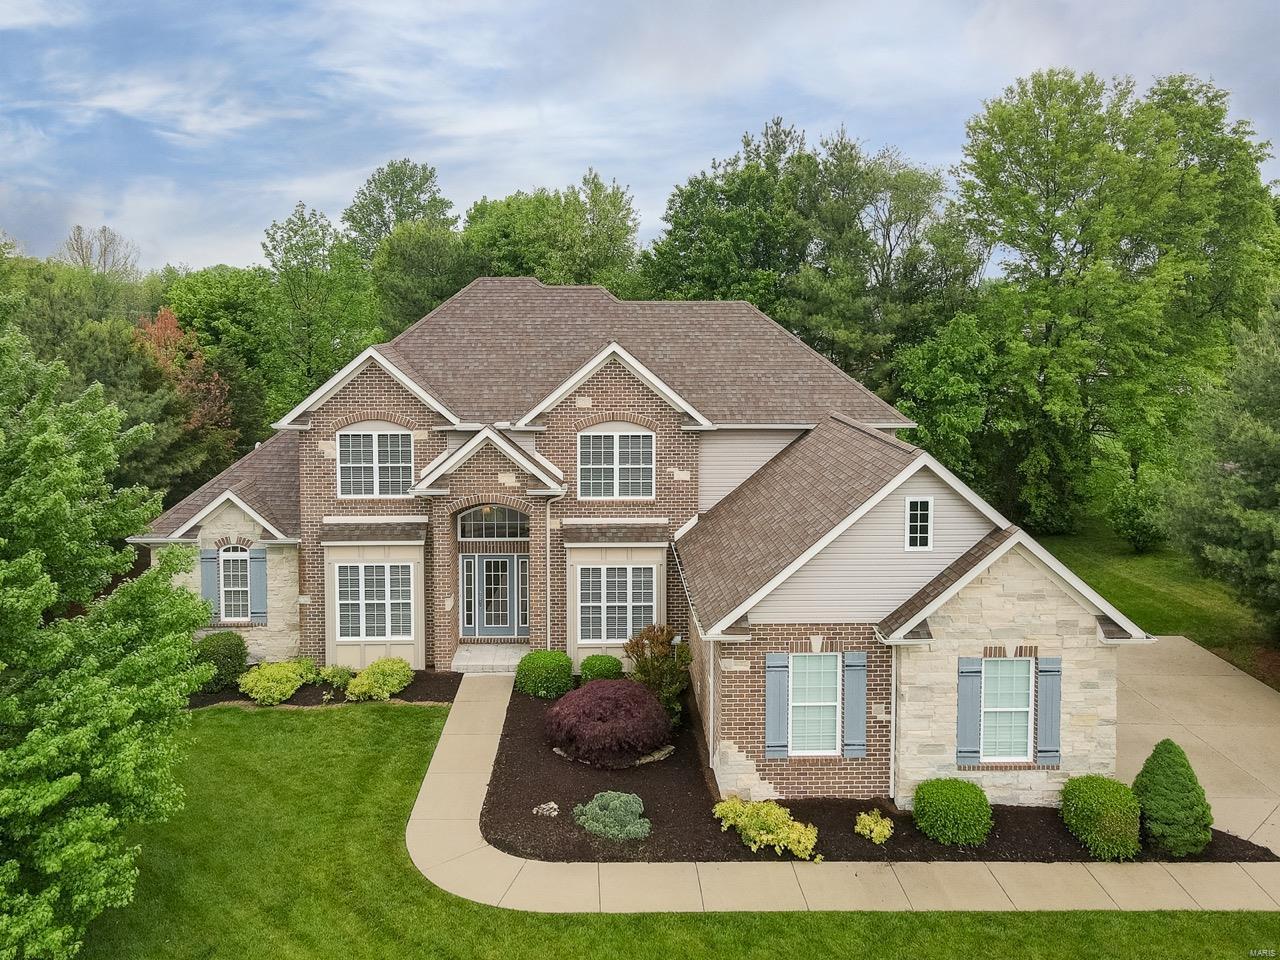 1011 Barteau Drive Property Photo - Swansea, IL real estate listing